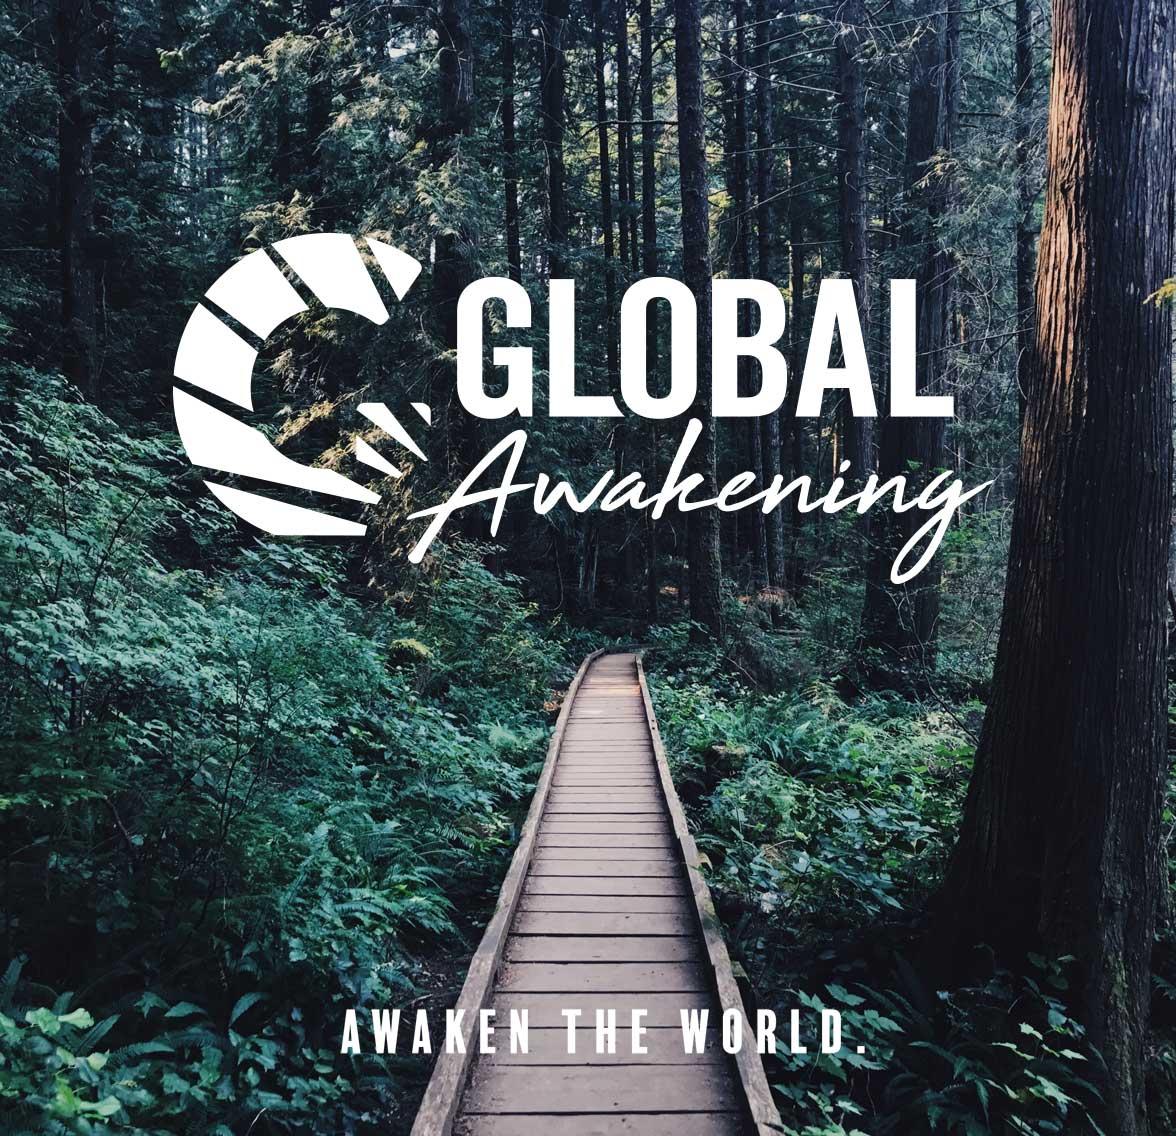 second poster of new Global Awakening logo